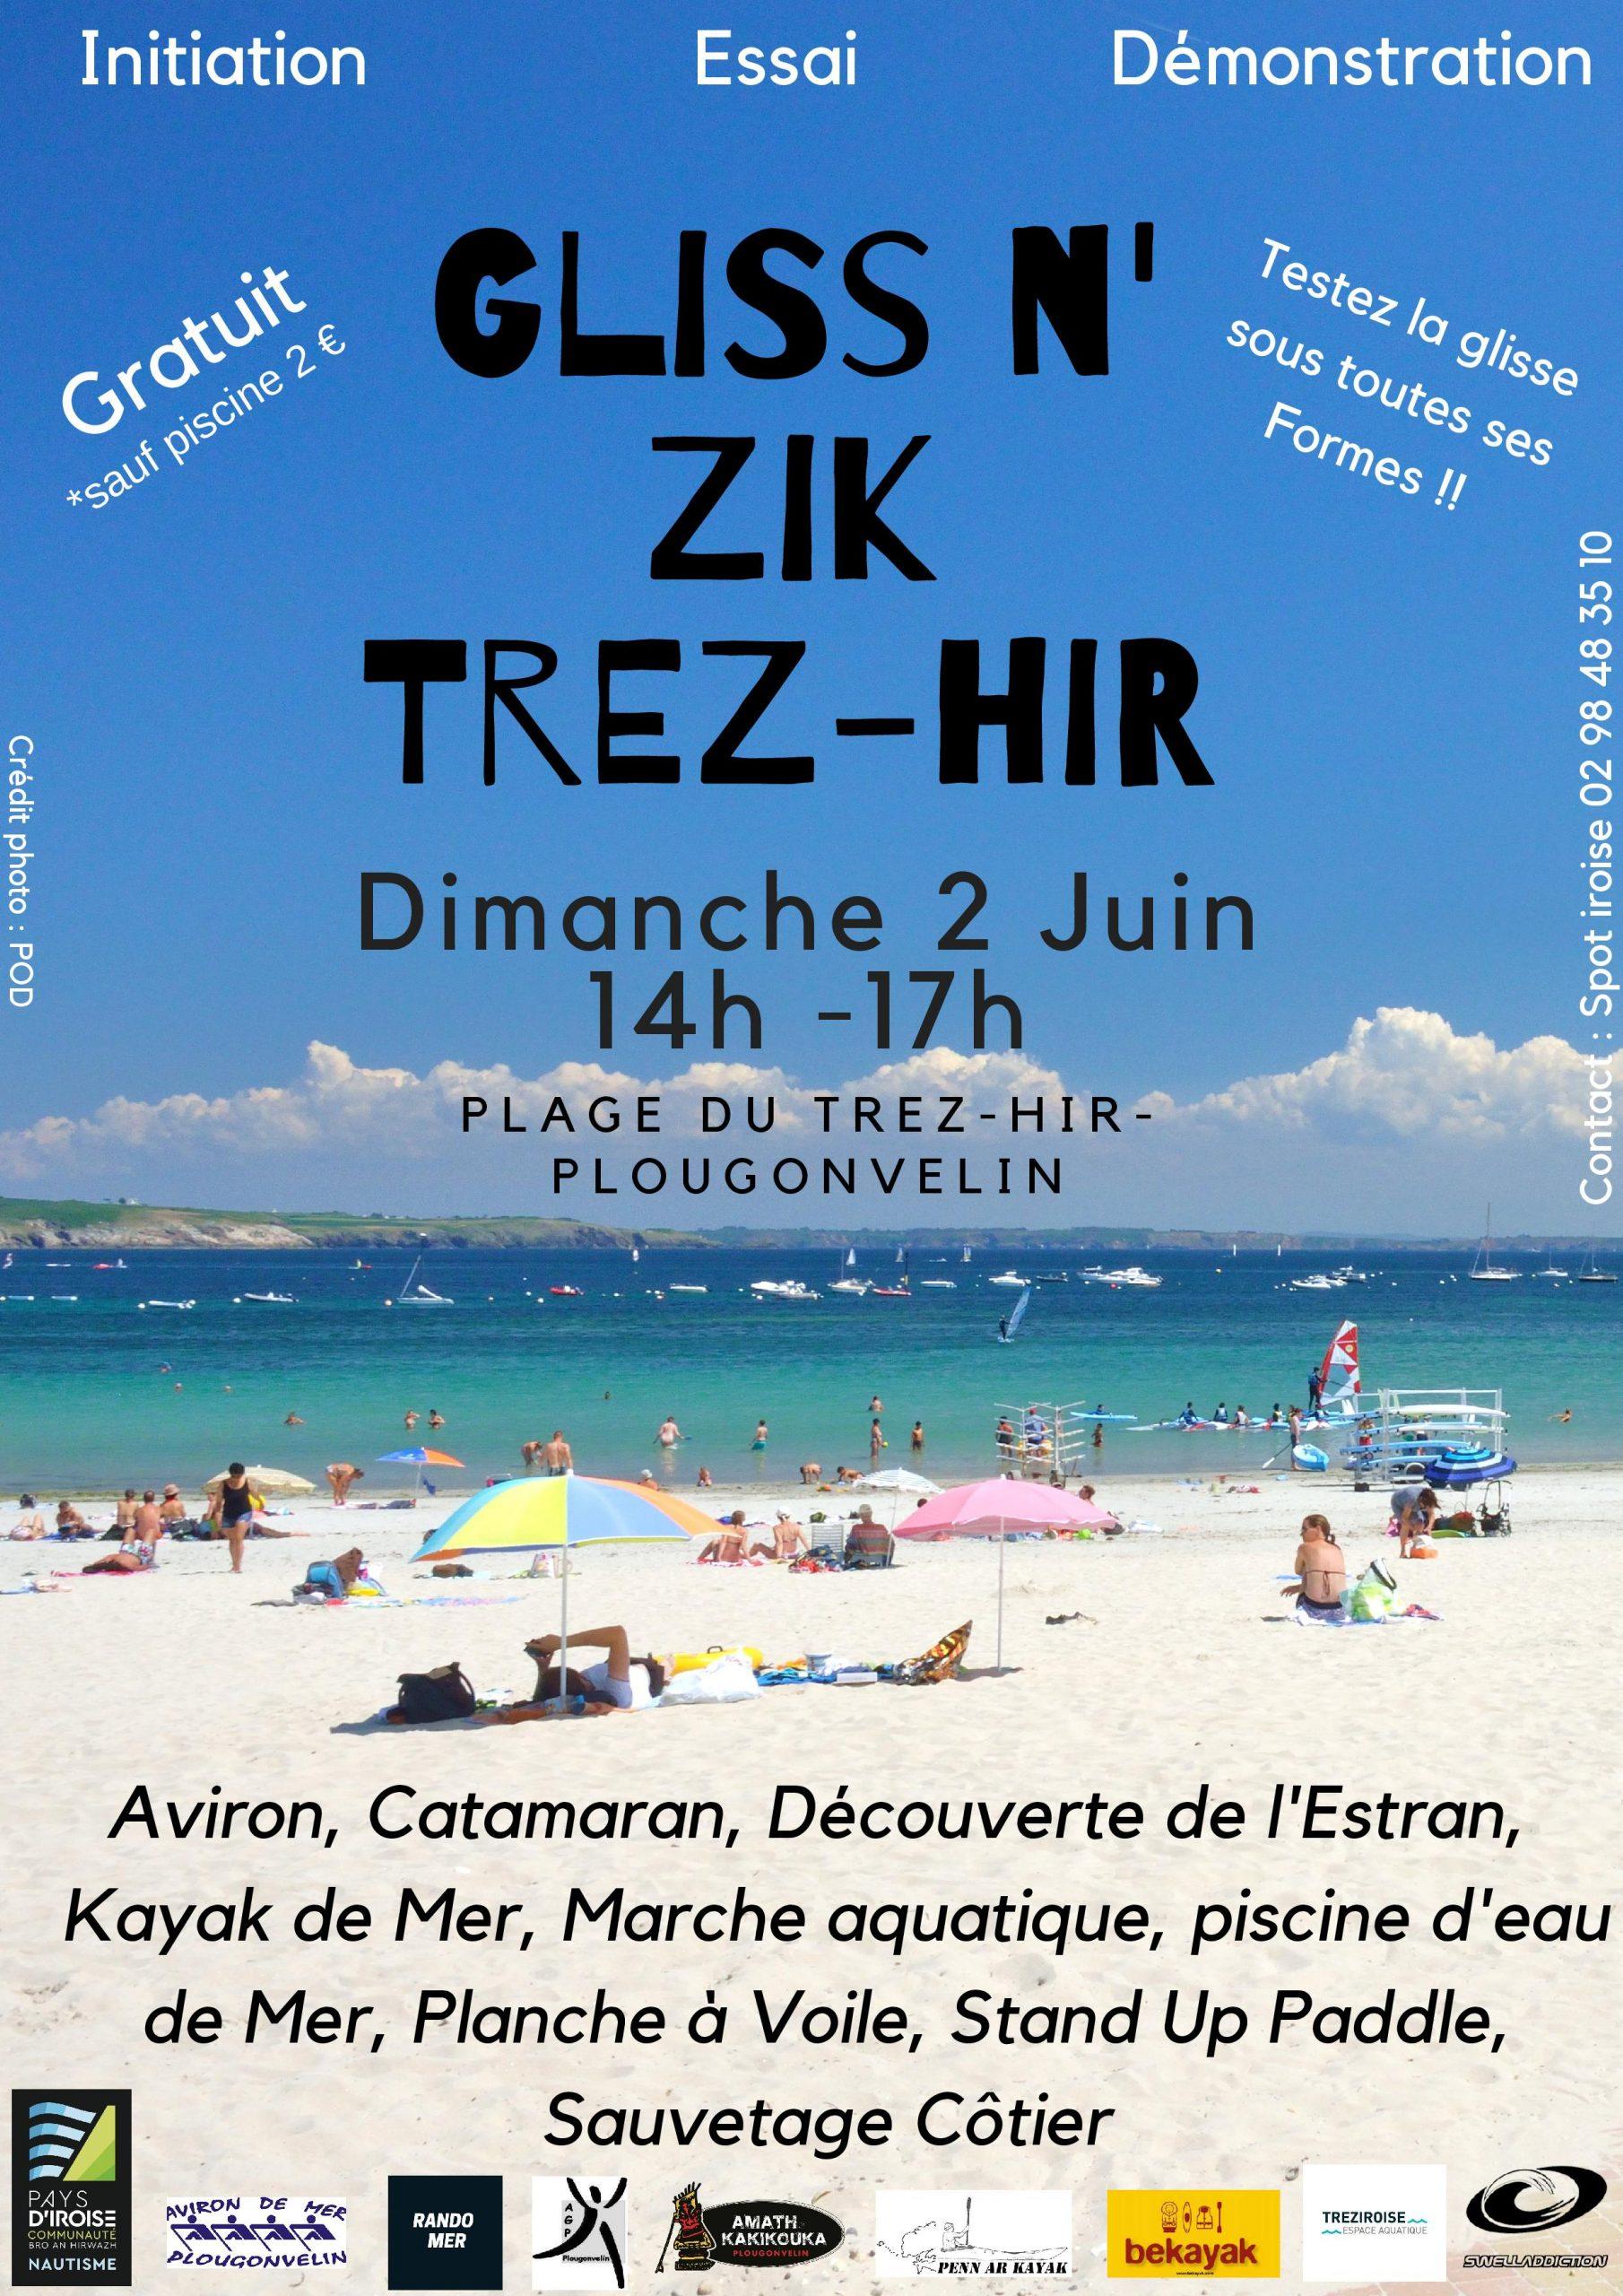 Gliss N'zik Trez-Hir | Office De Tourisme De Iroise Bretagne ... tout Zik Piscine